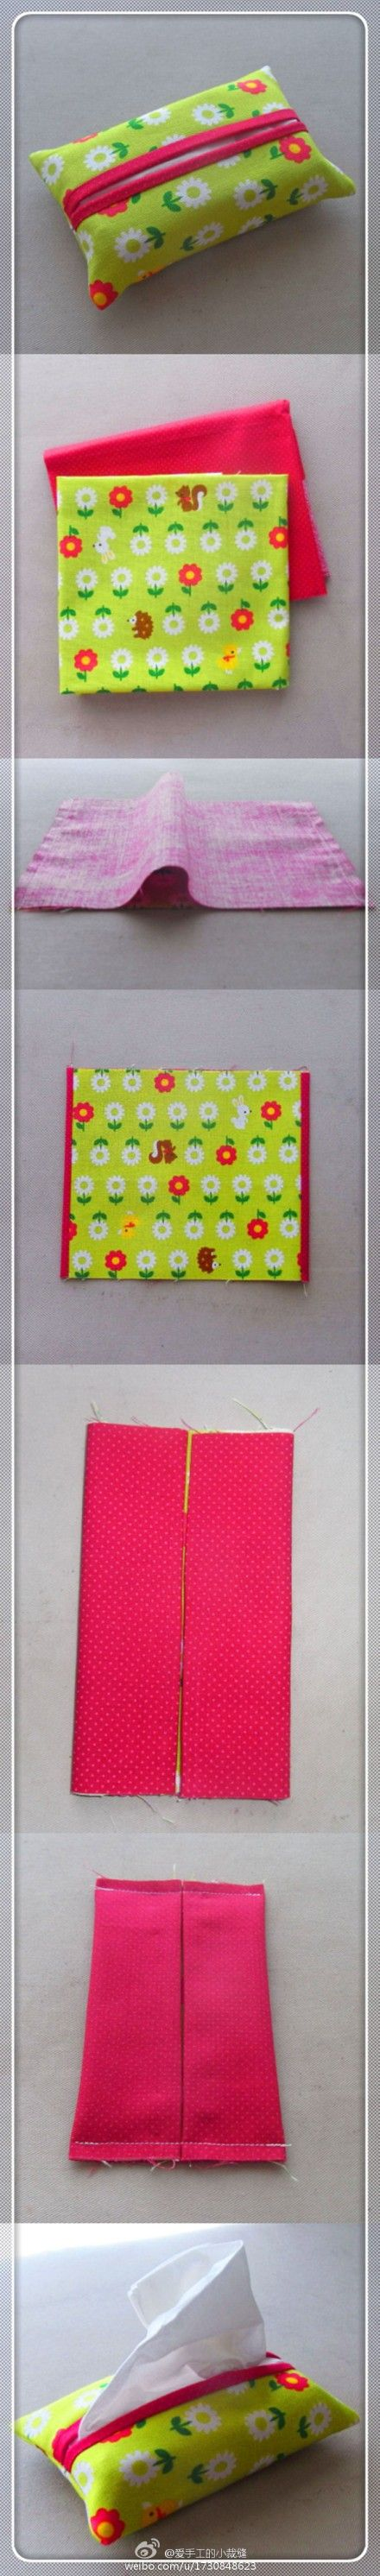 Tissue holder - another version